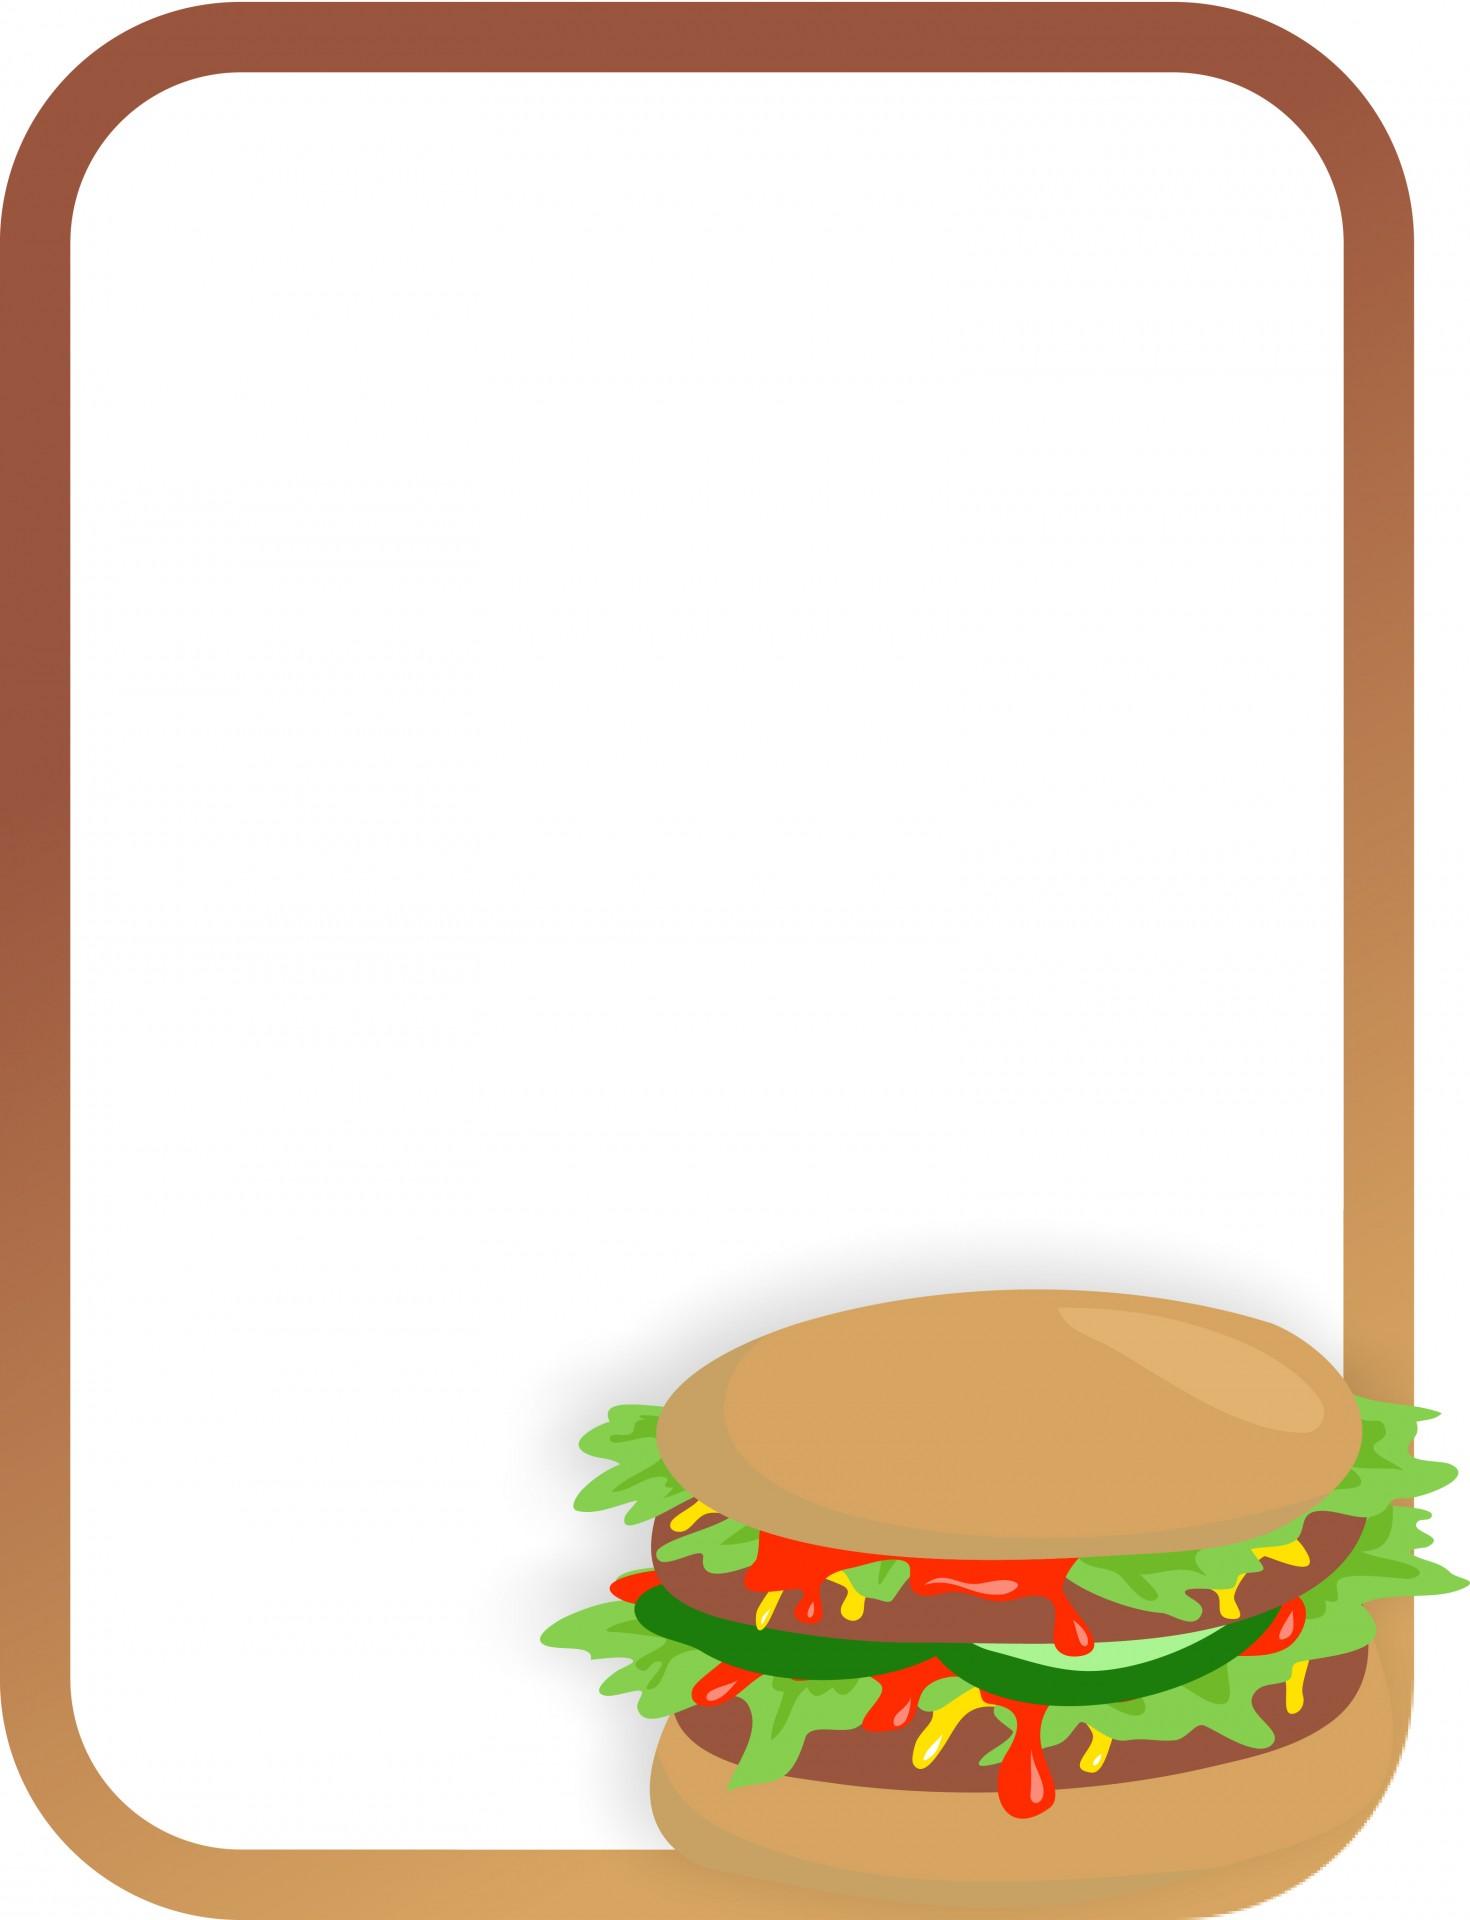 Burger clipart border, Burger border Transparent FREE for.